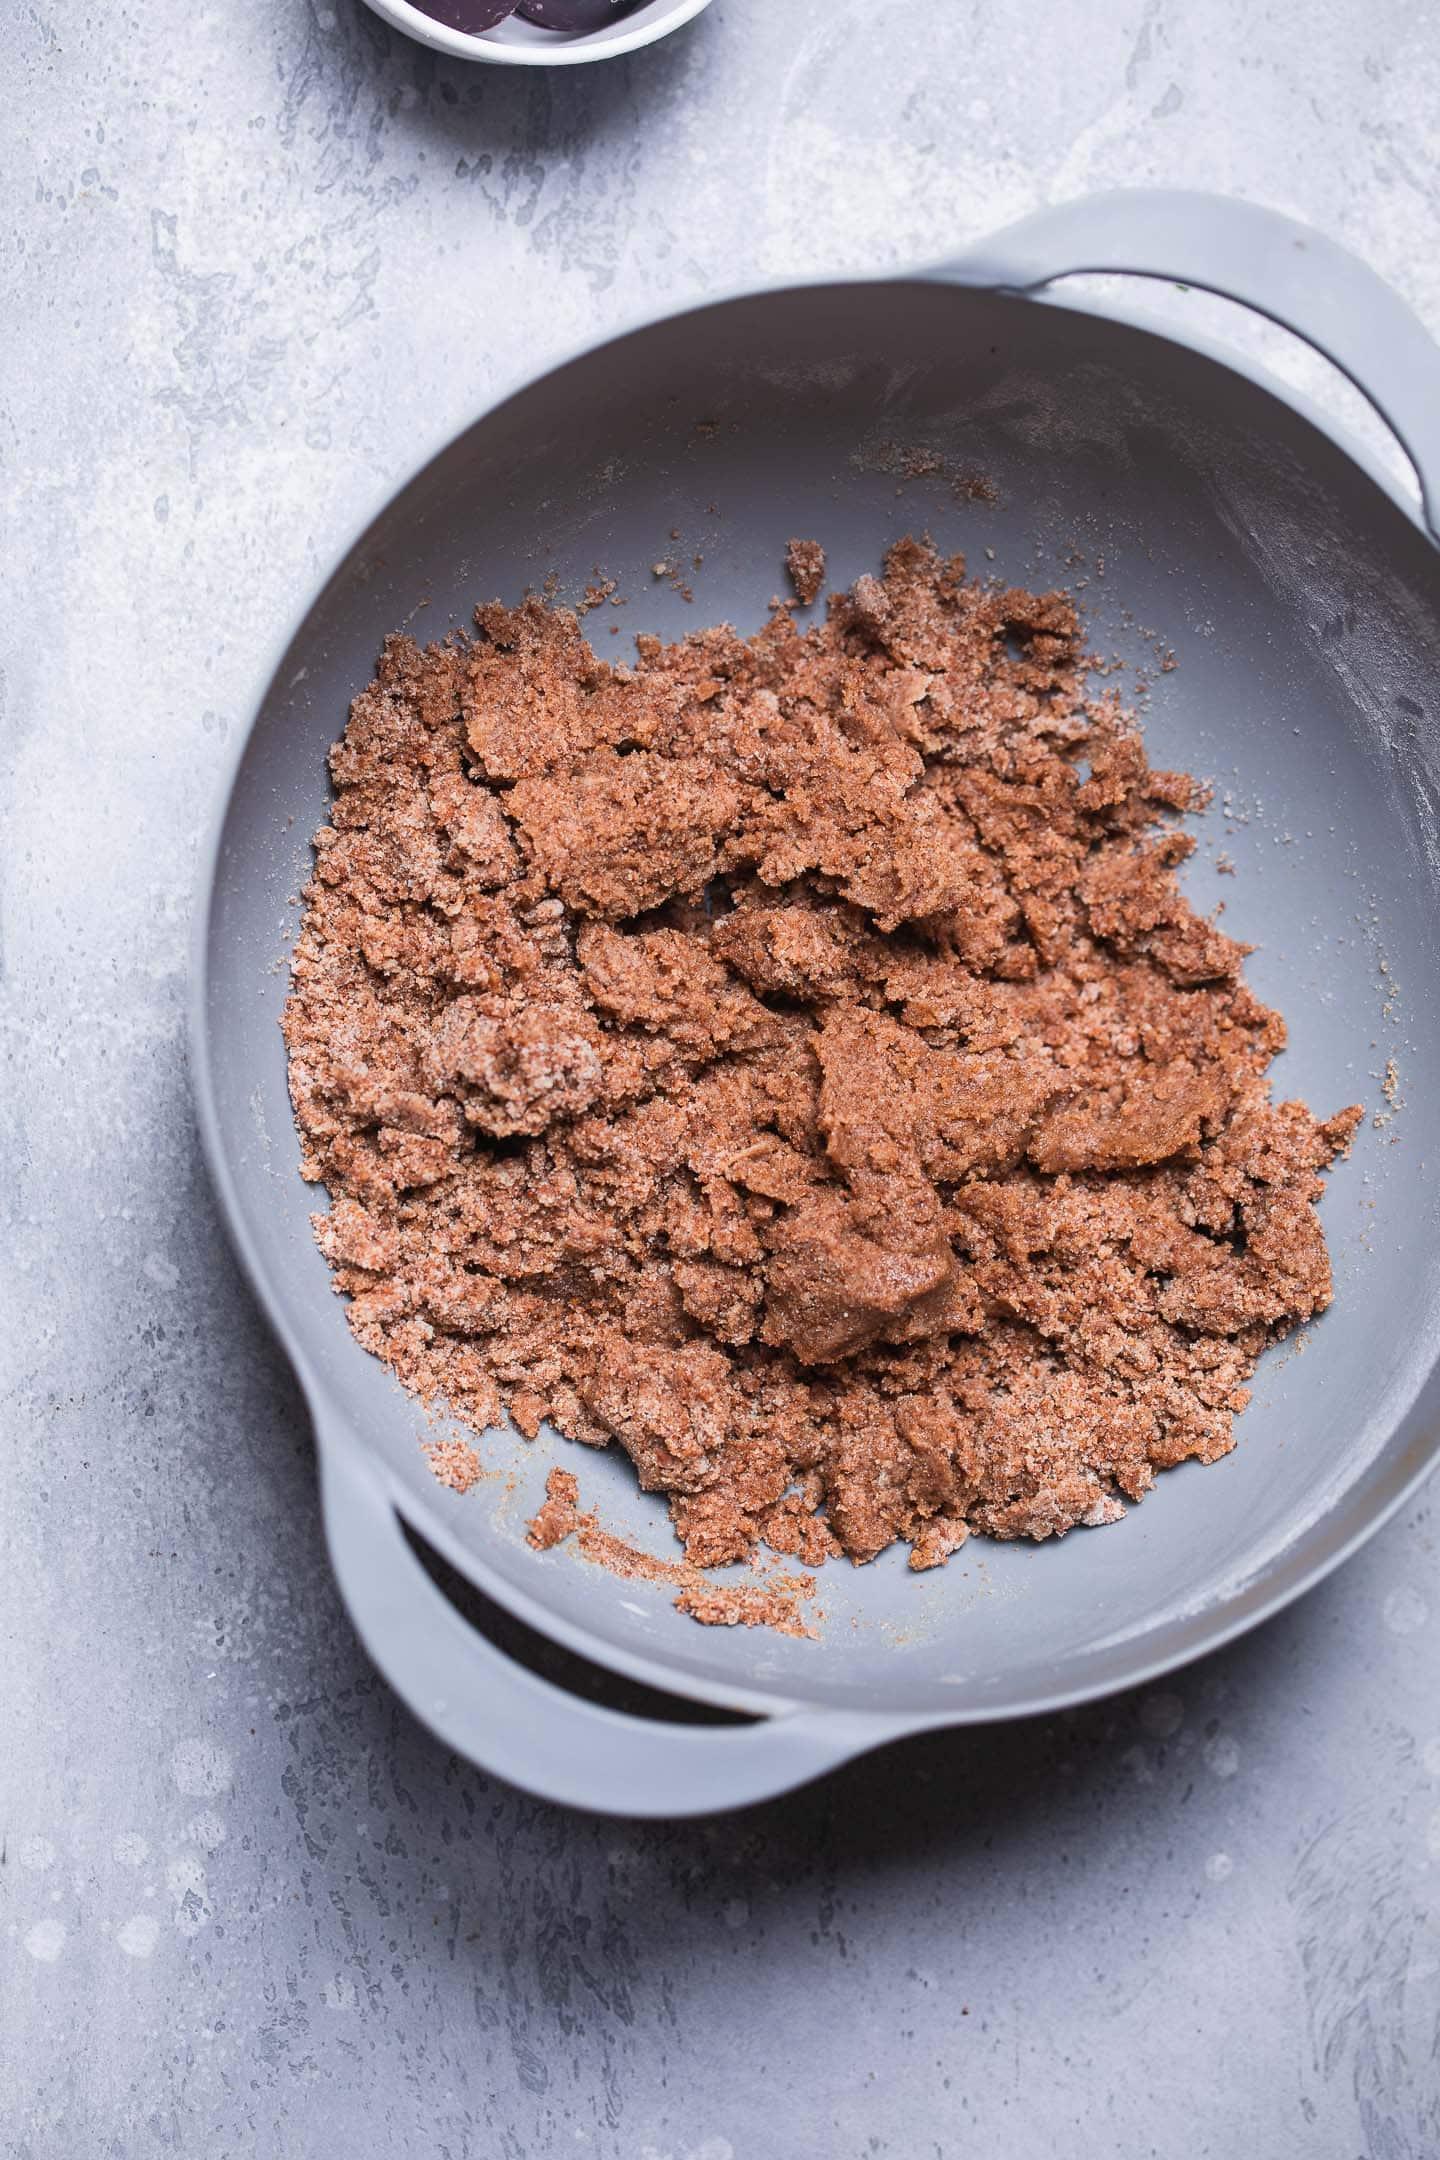 Vegan cookie dough in a mixing bowl